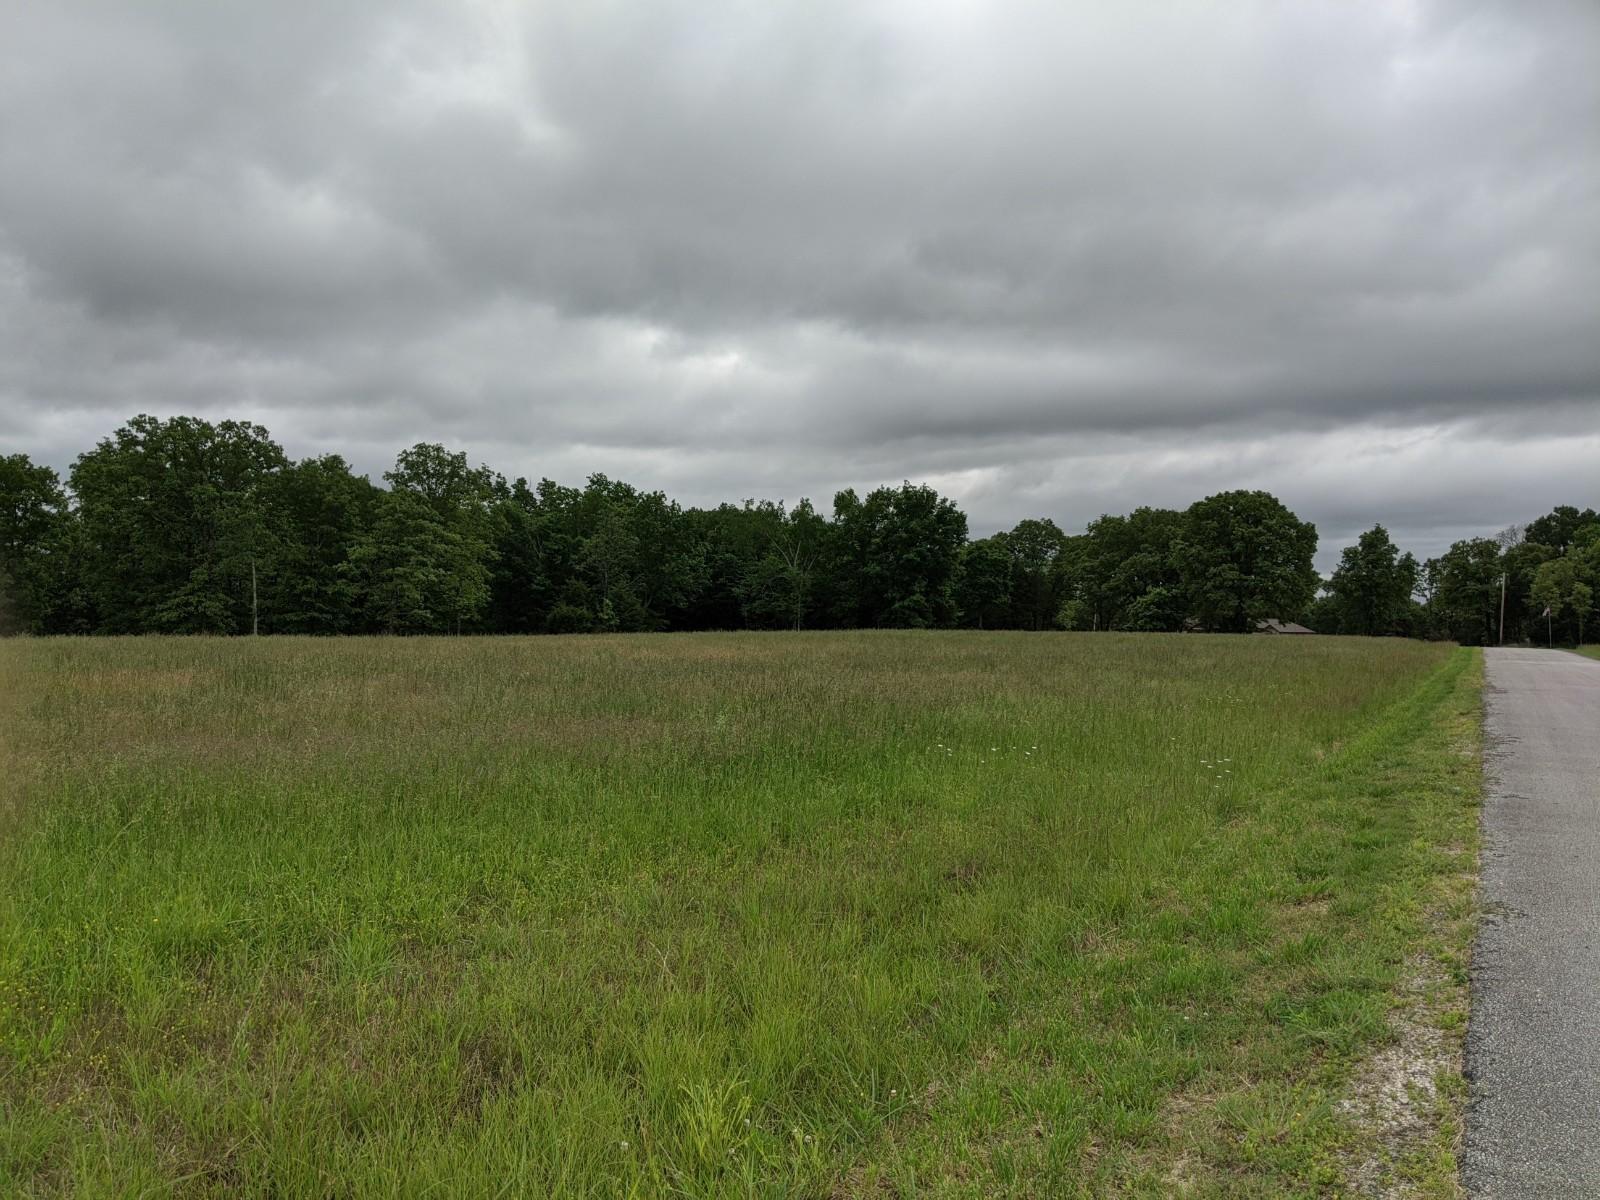 Tbd Long View Forsyth, MO 65653